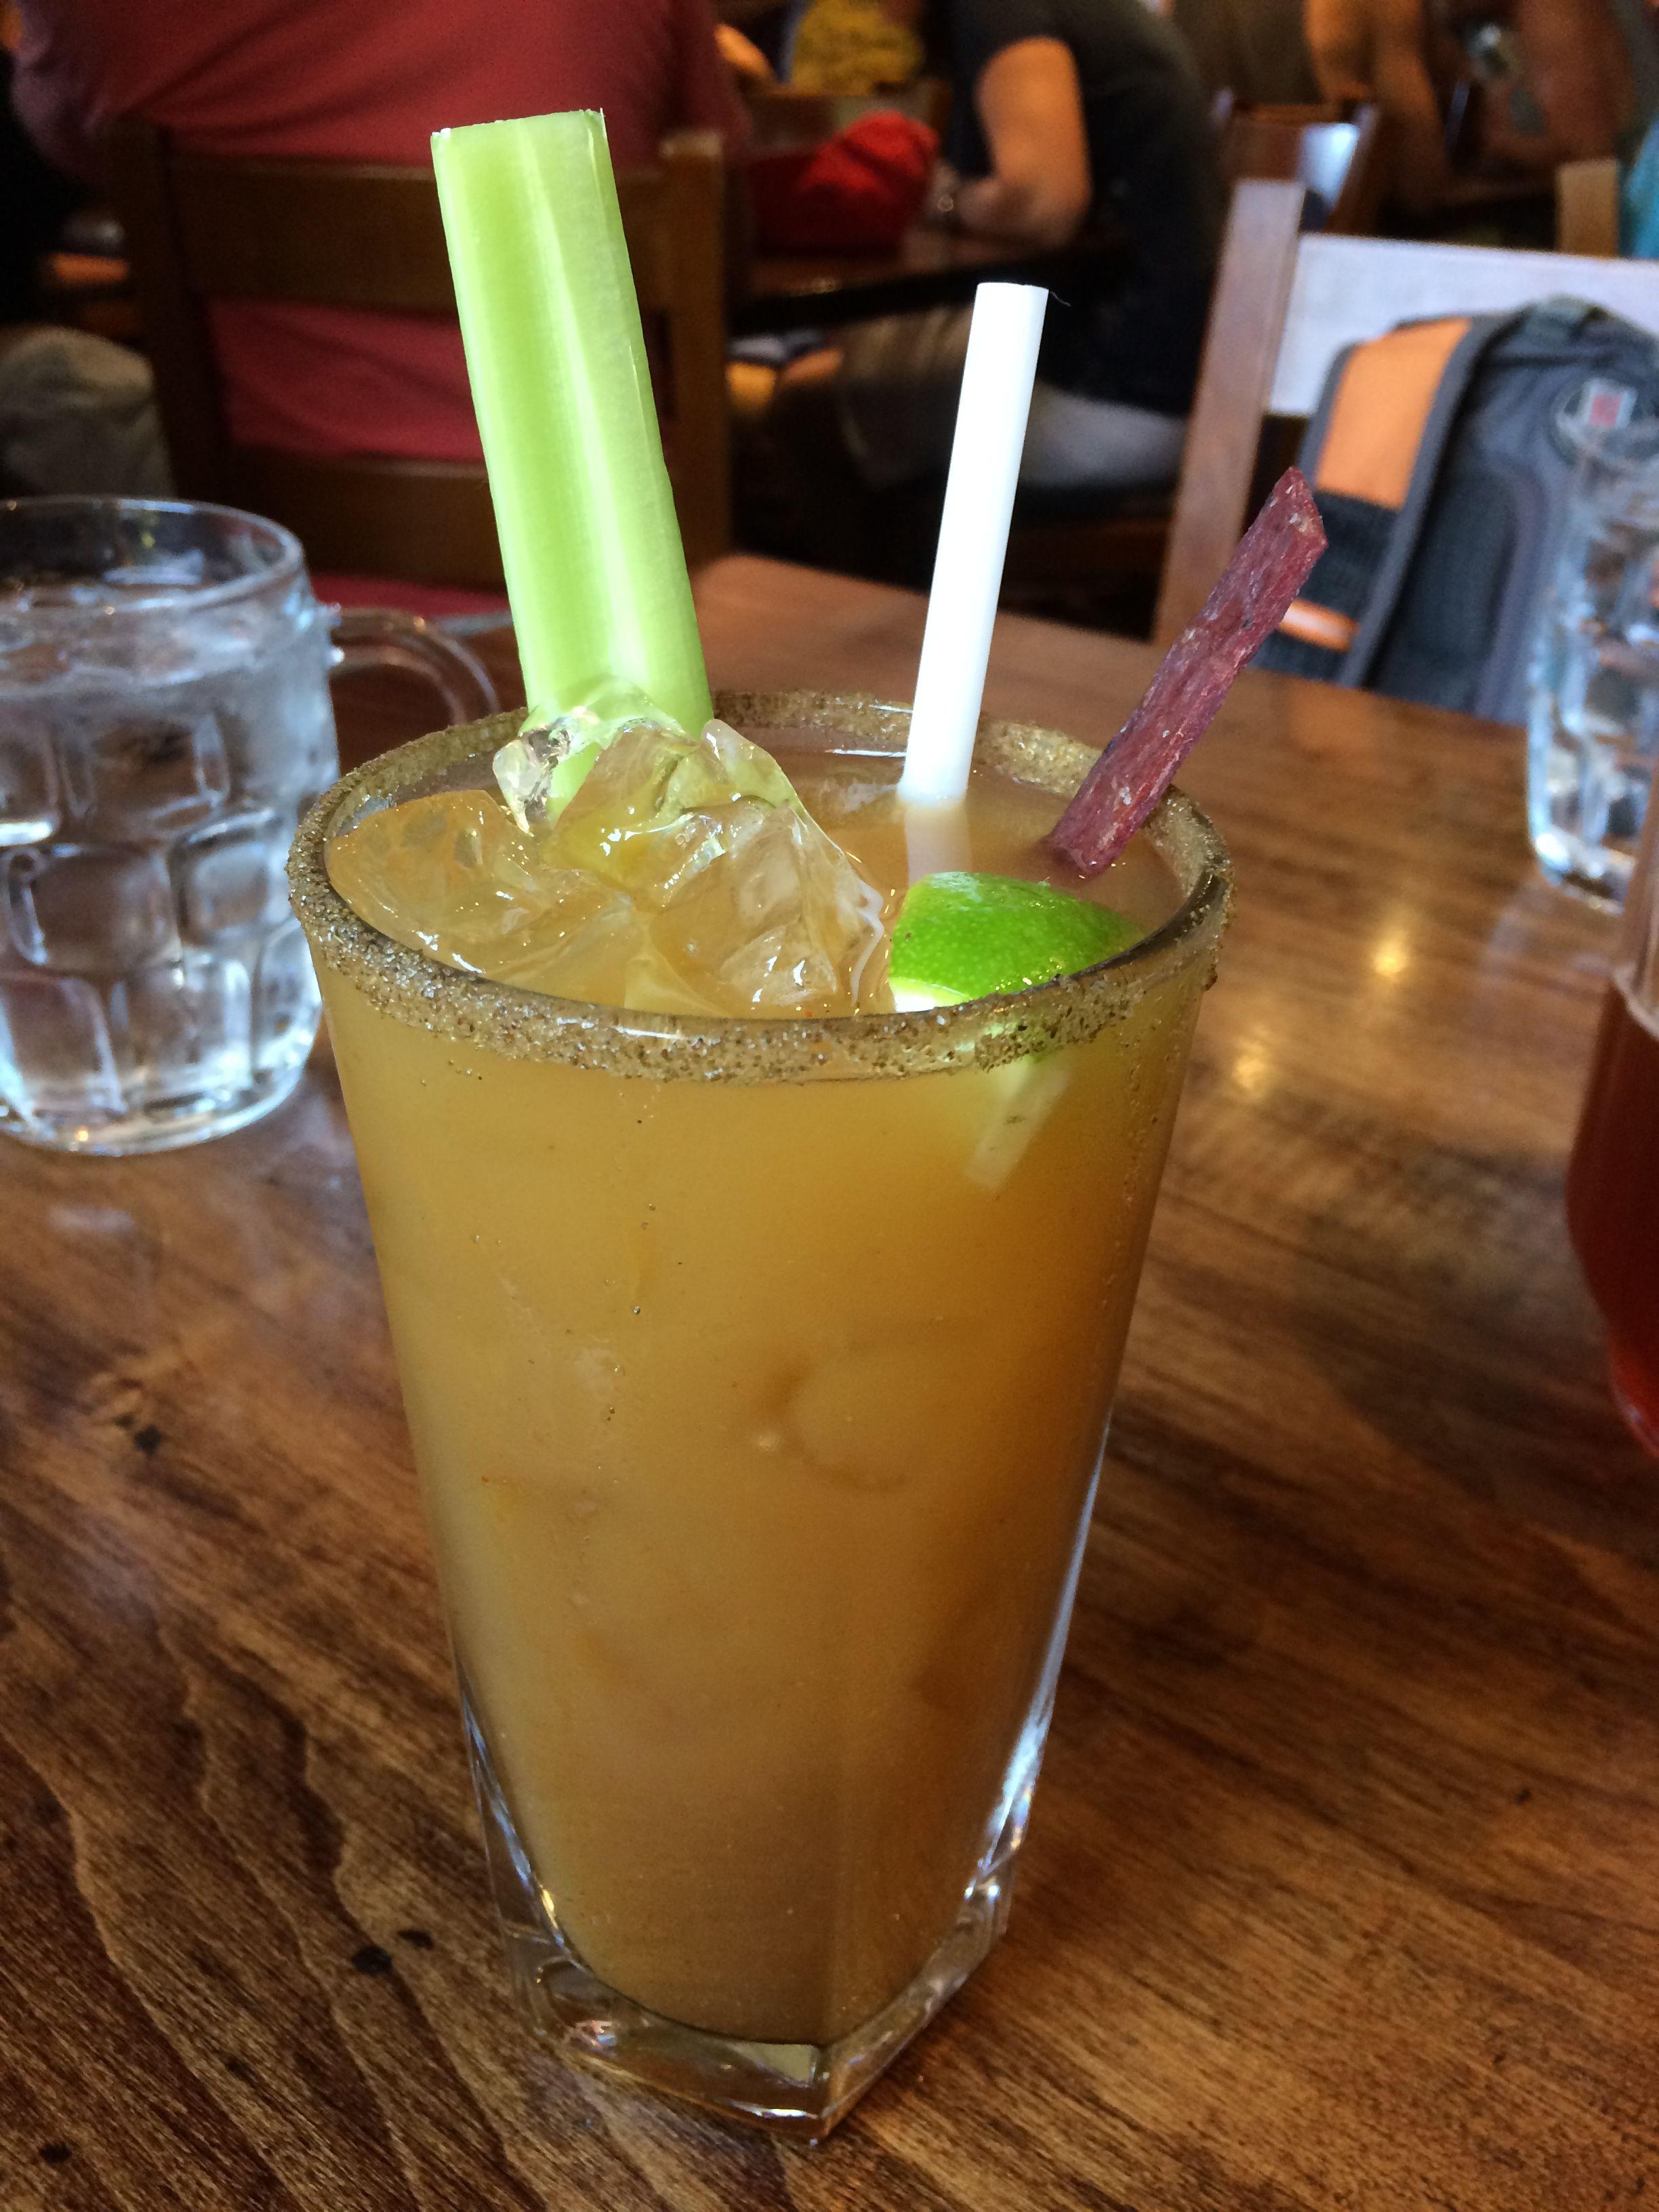 Pineapple Caesar at Dusty's Bar & BBQ in Whistler, BC (http://eatnorth.ca/eat-north/pineapple-basil-caesar)